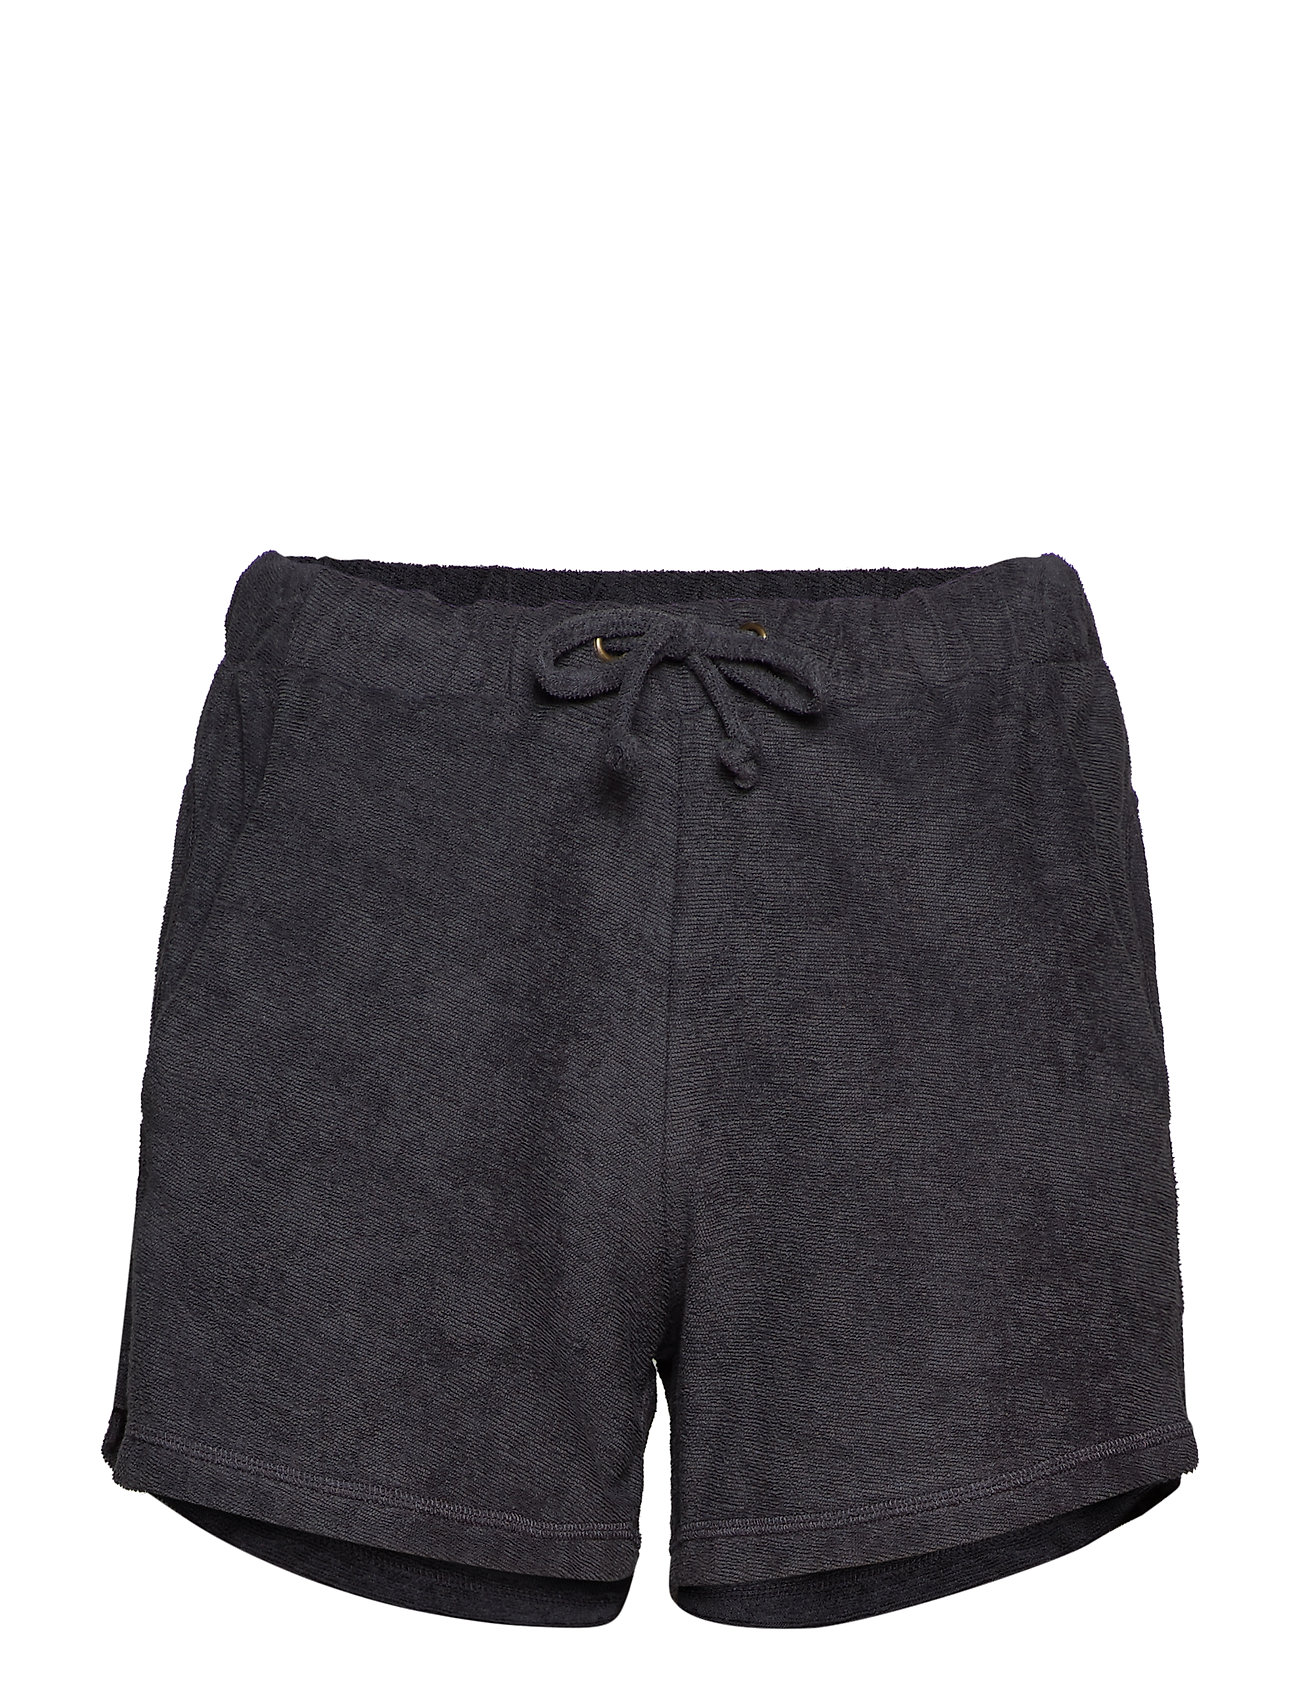 Rabens Saloner Towelling shorts - FADED BLACK